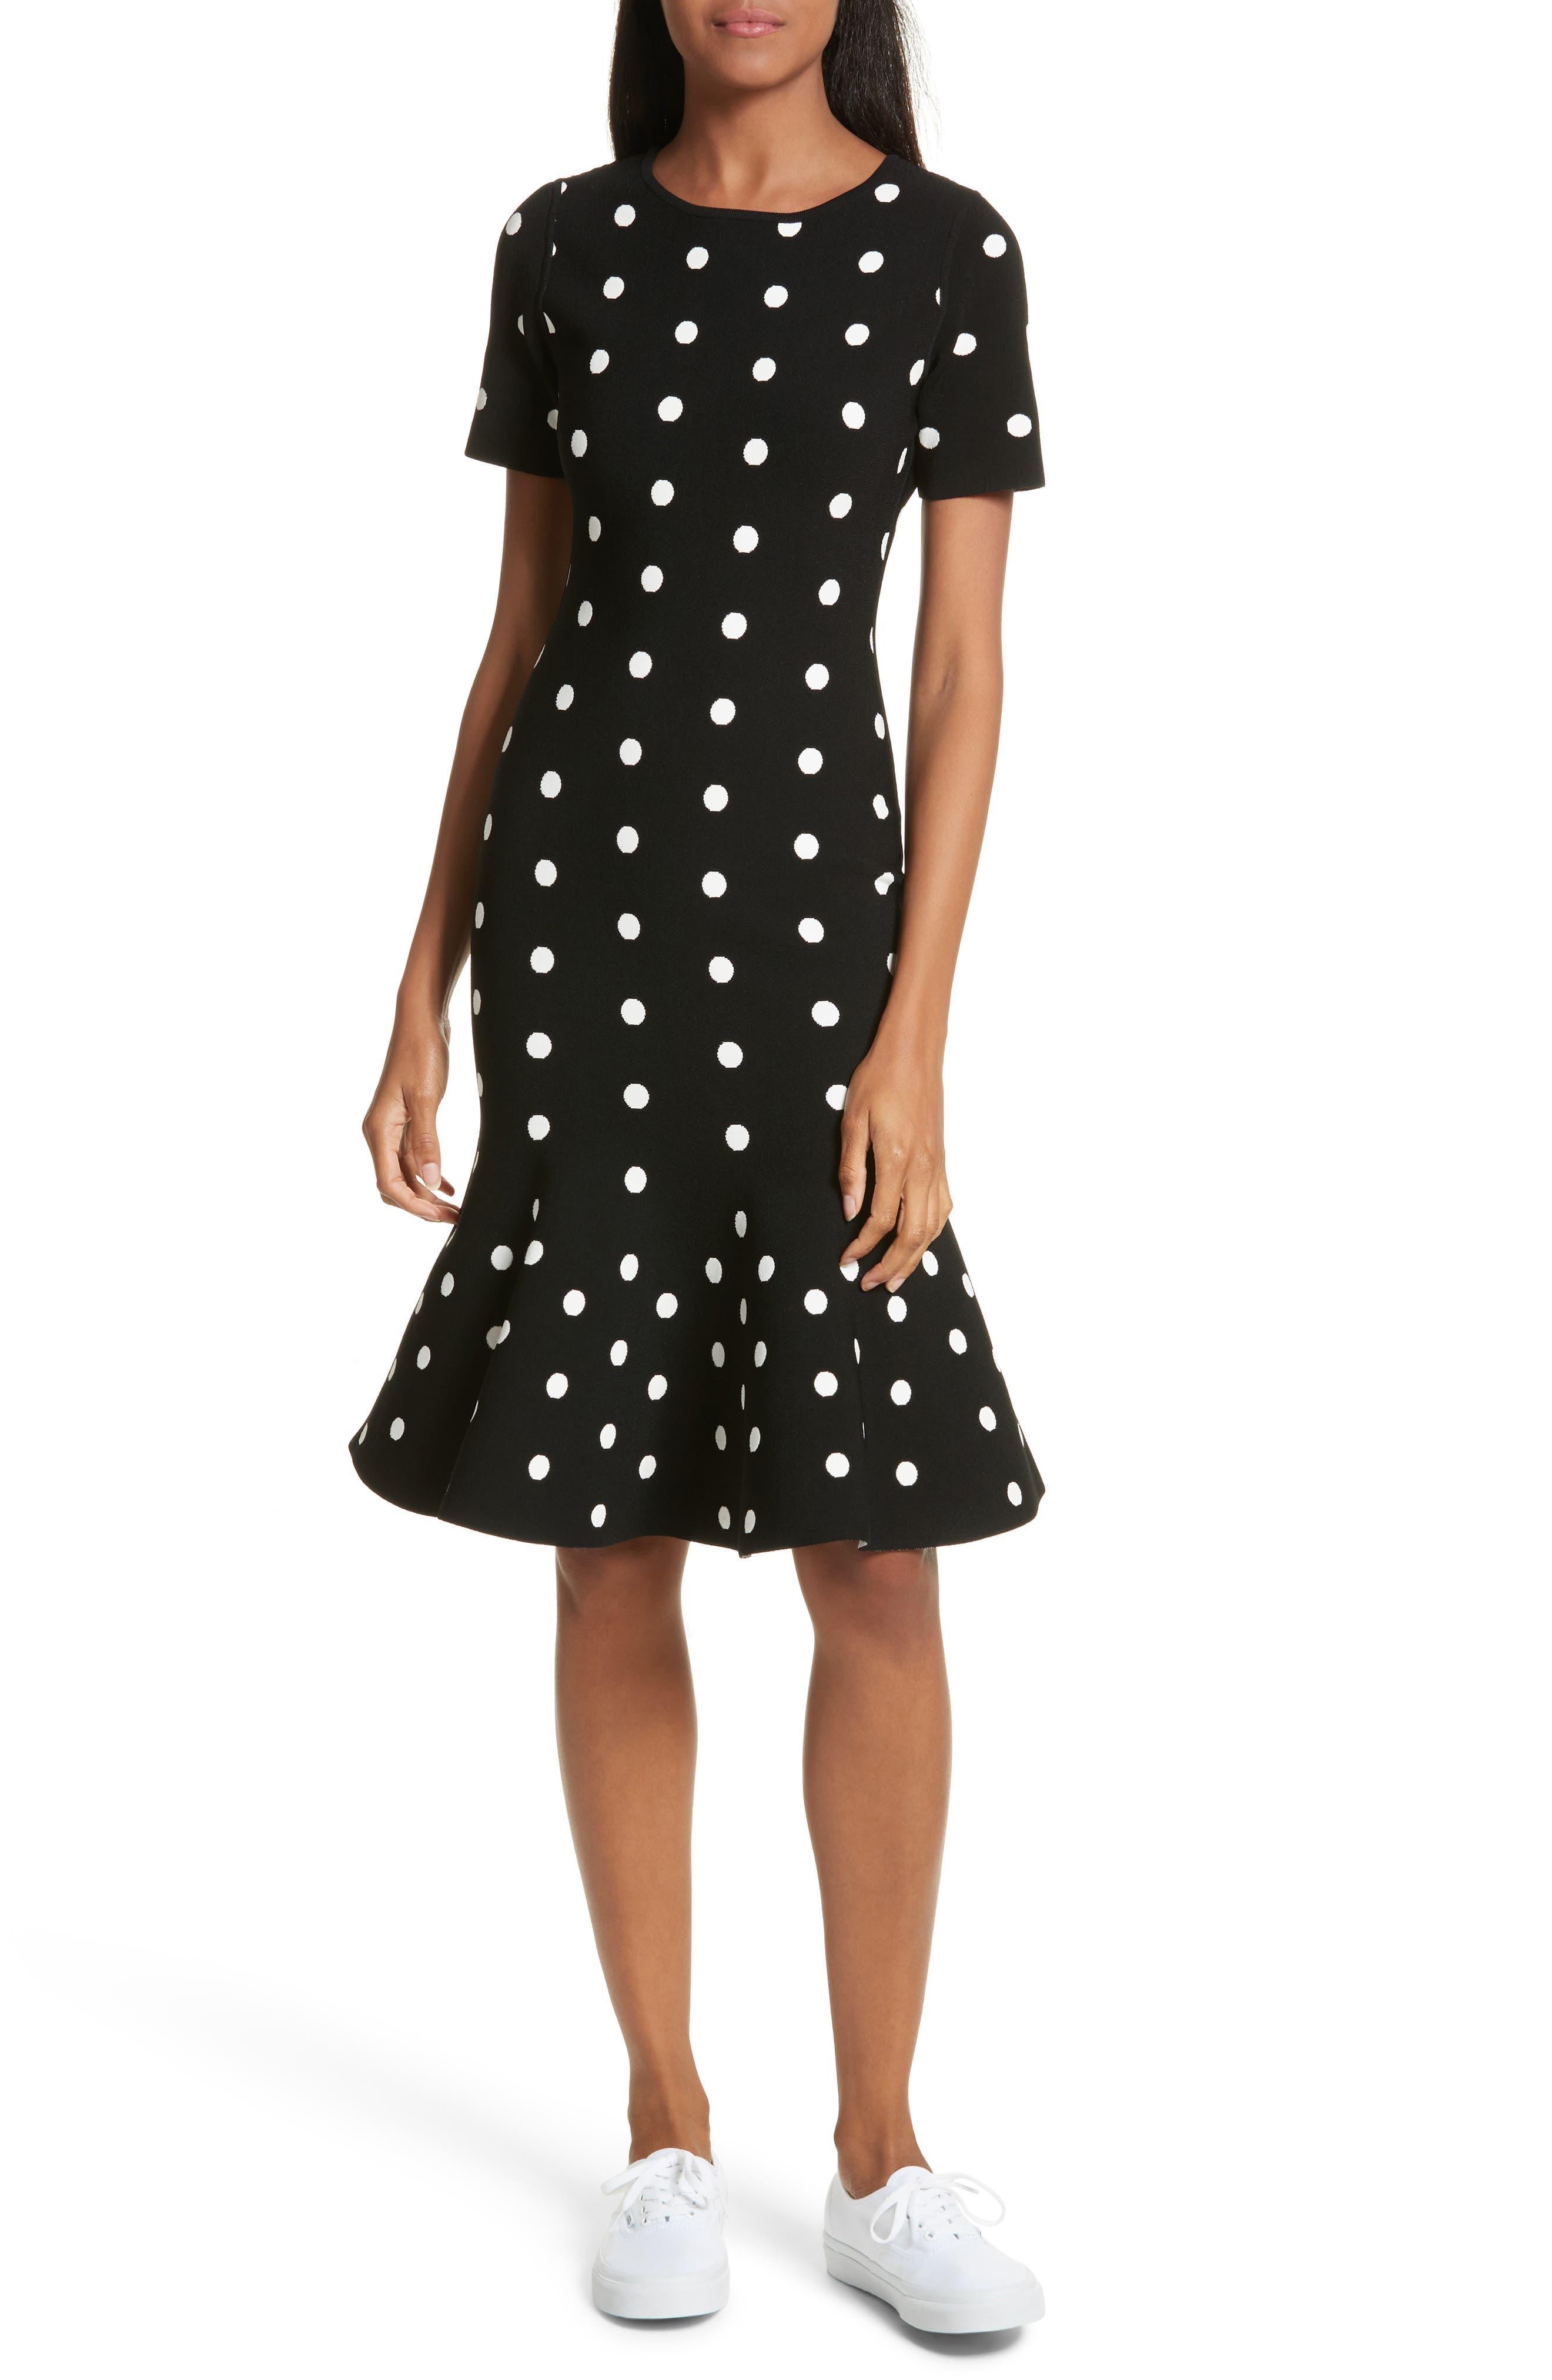 Alternate Image 1 Selected - Milly Polka Dot Mermaid Dress